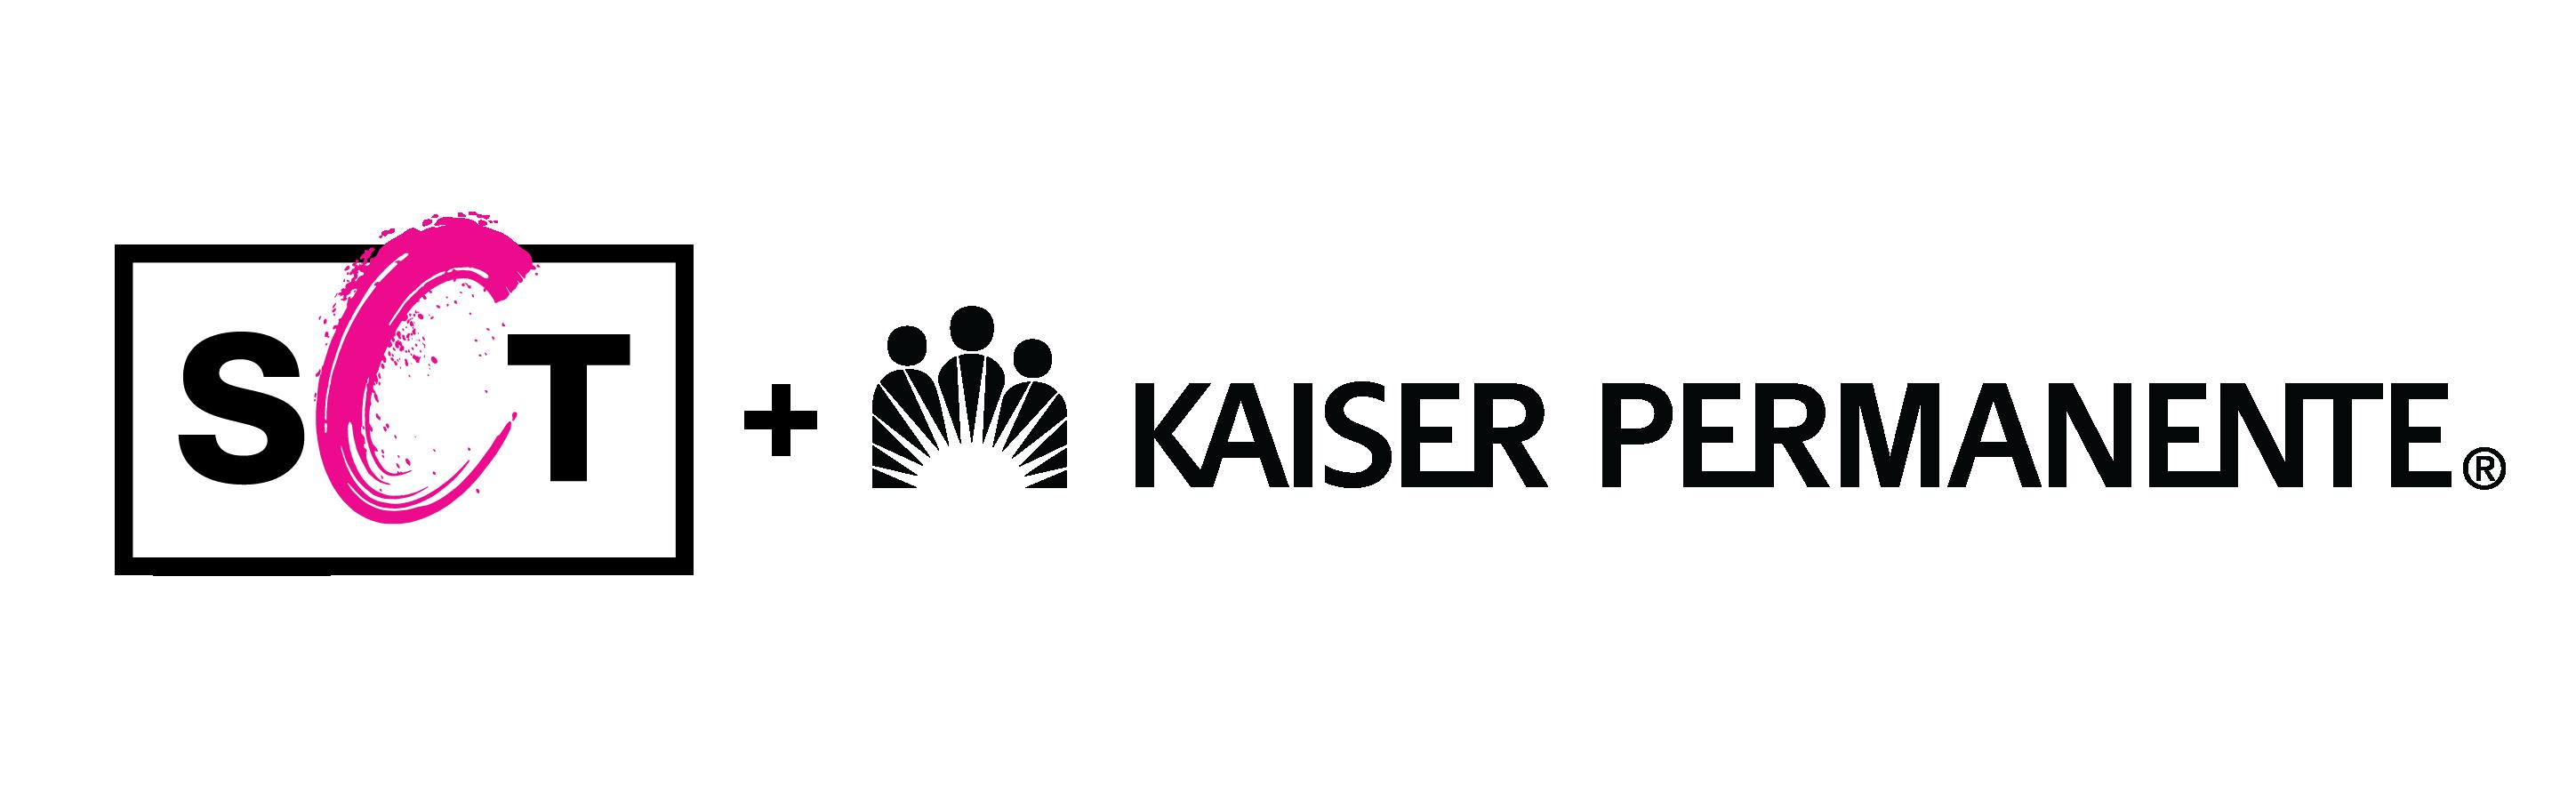 SCT Kaiser Permanente